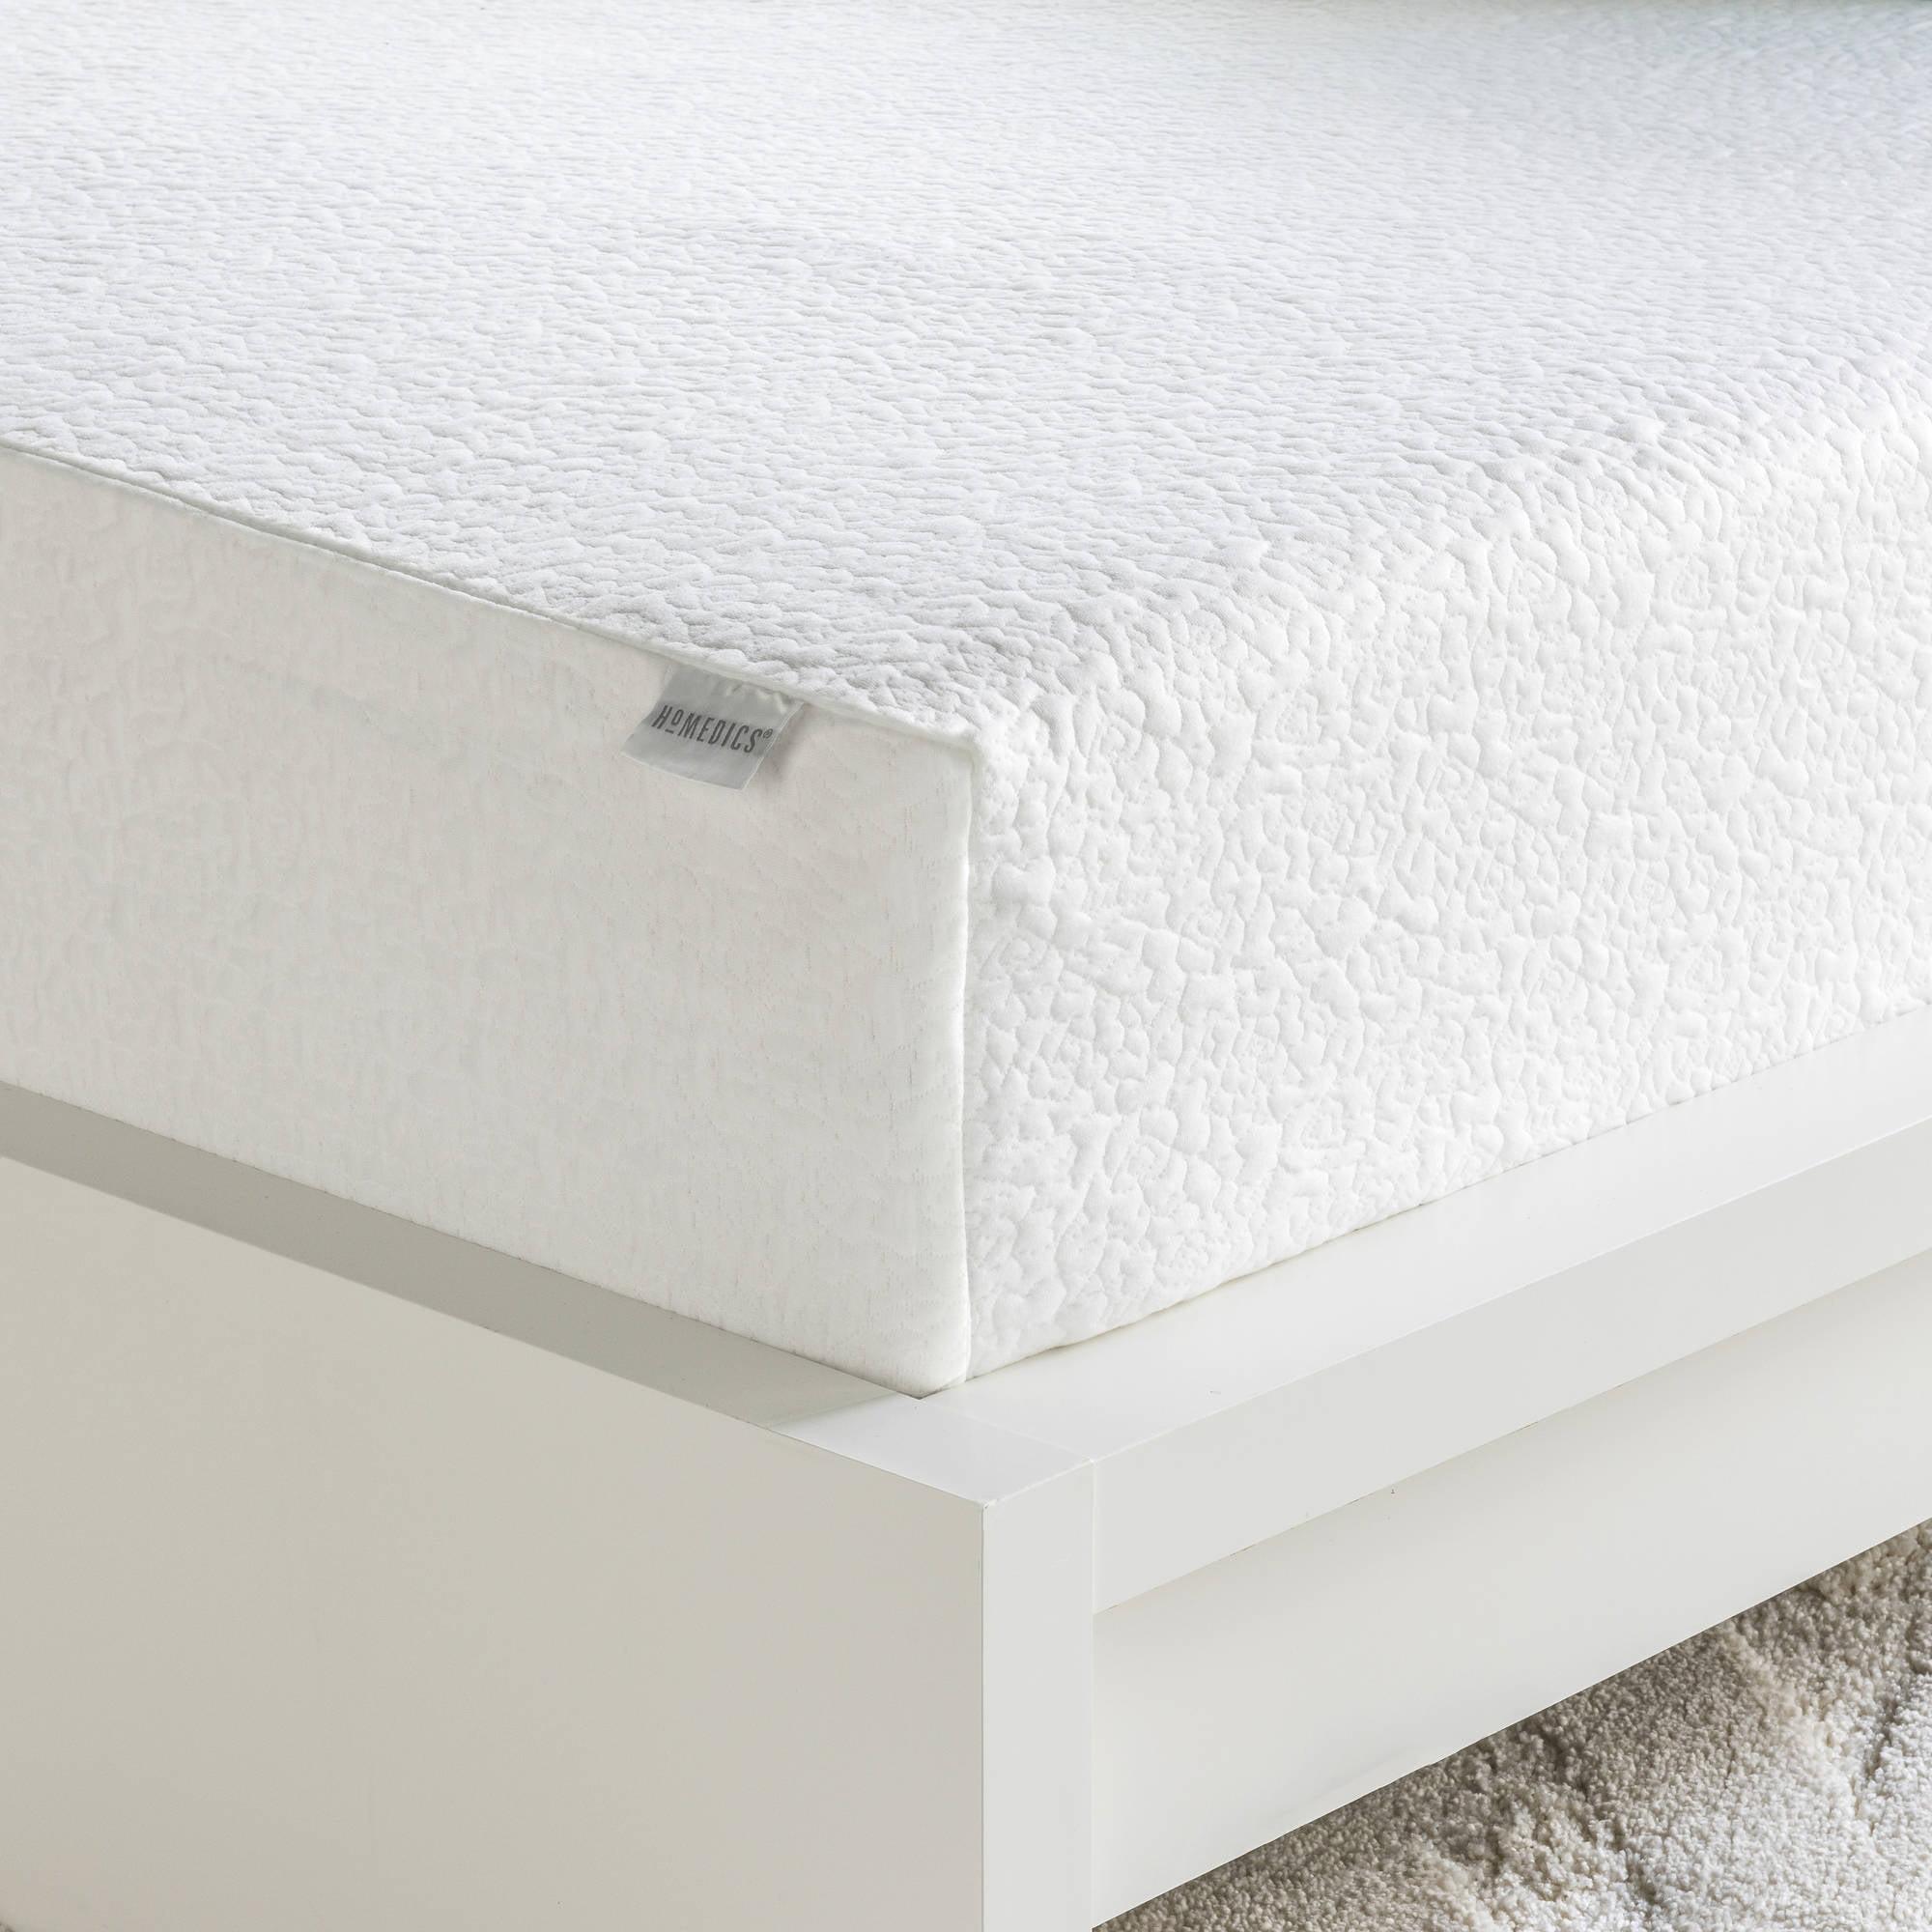 homedics 12 memory foam mattress multiple sizes walmart com